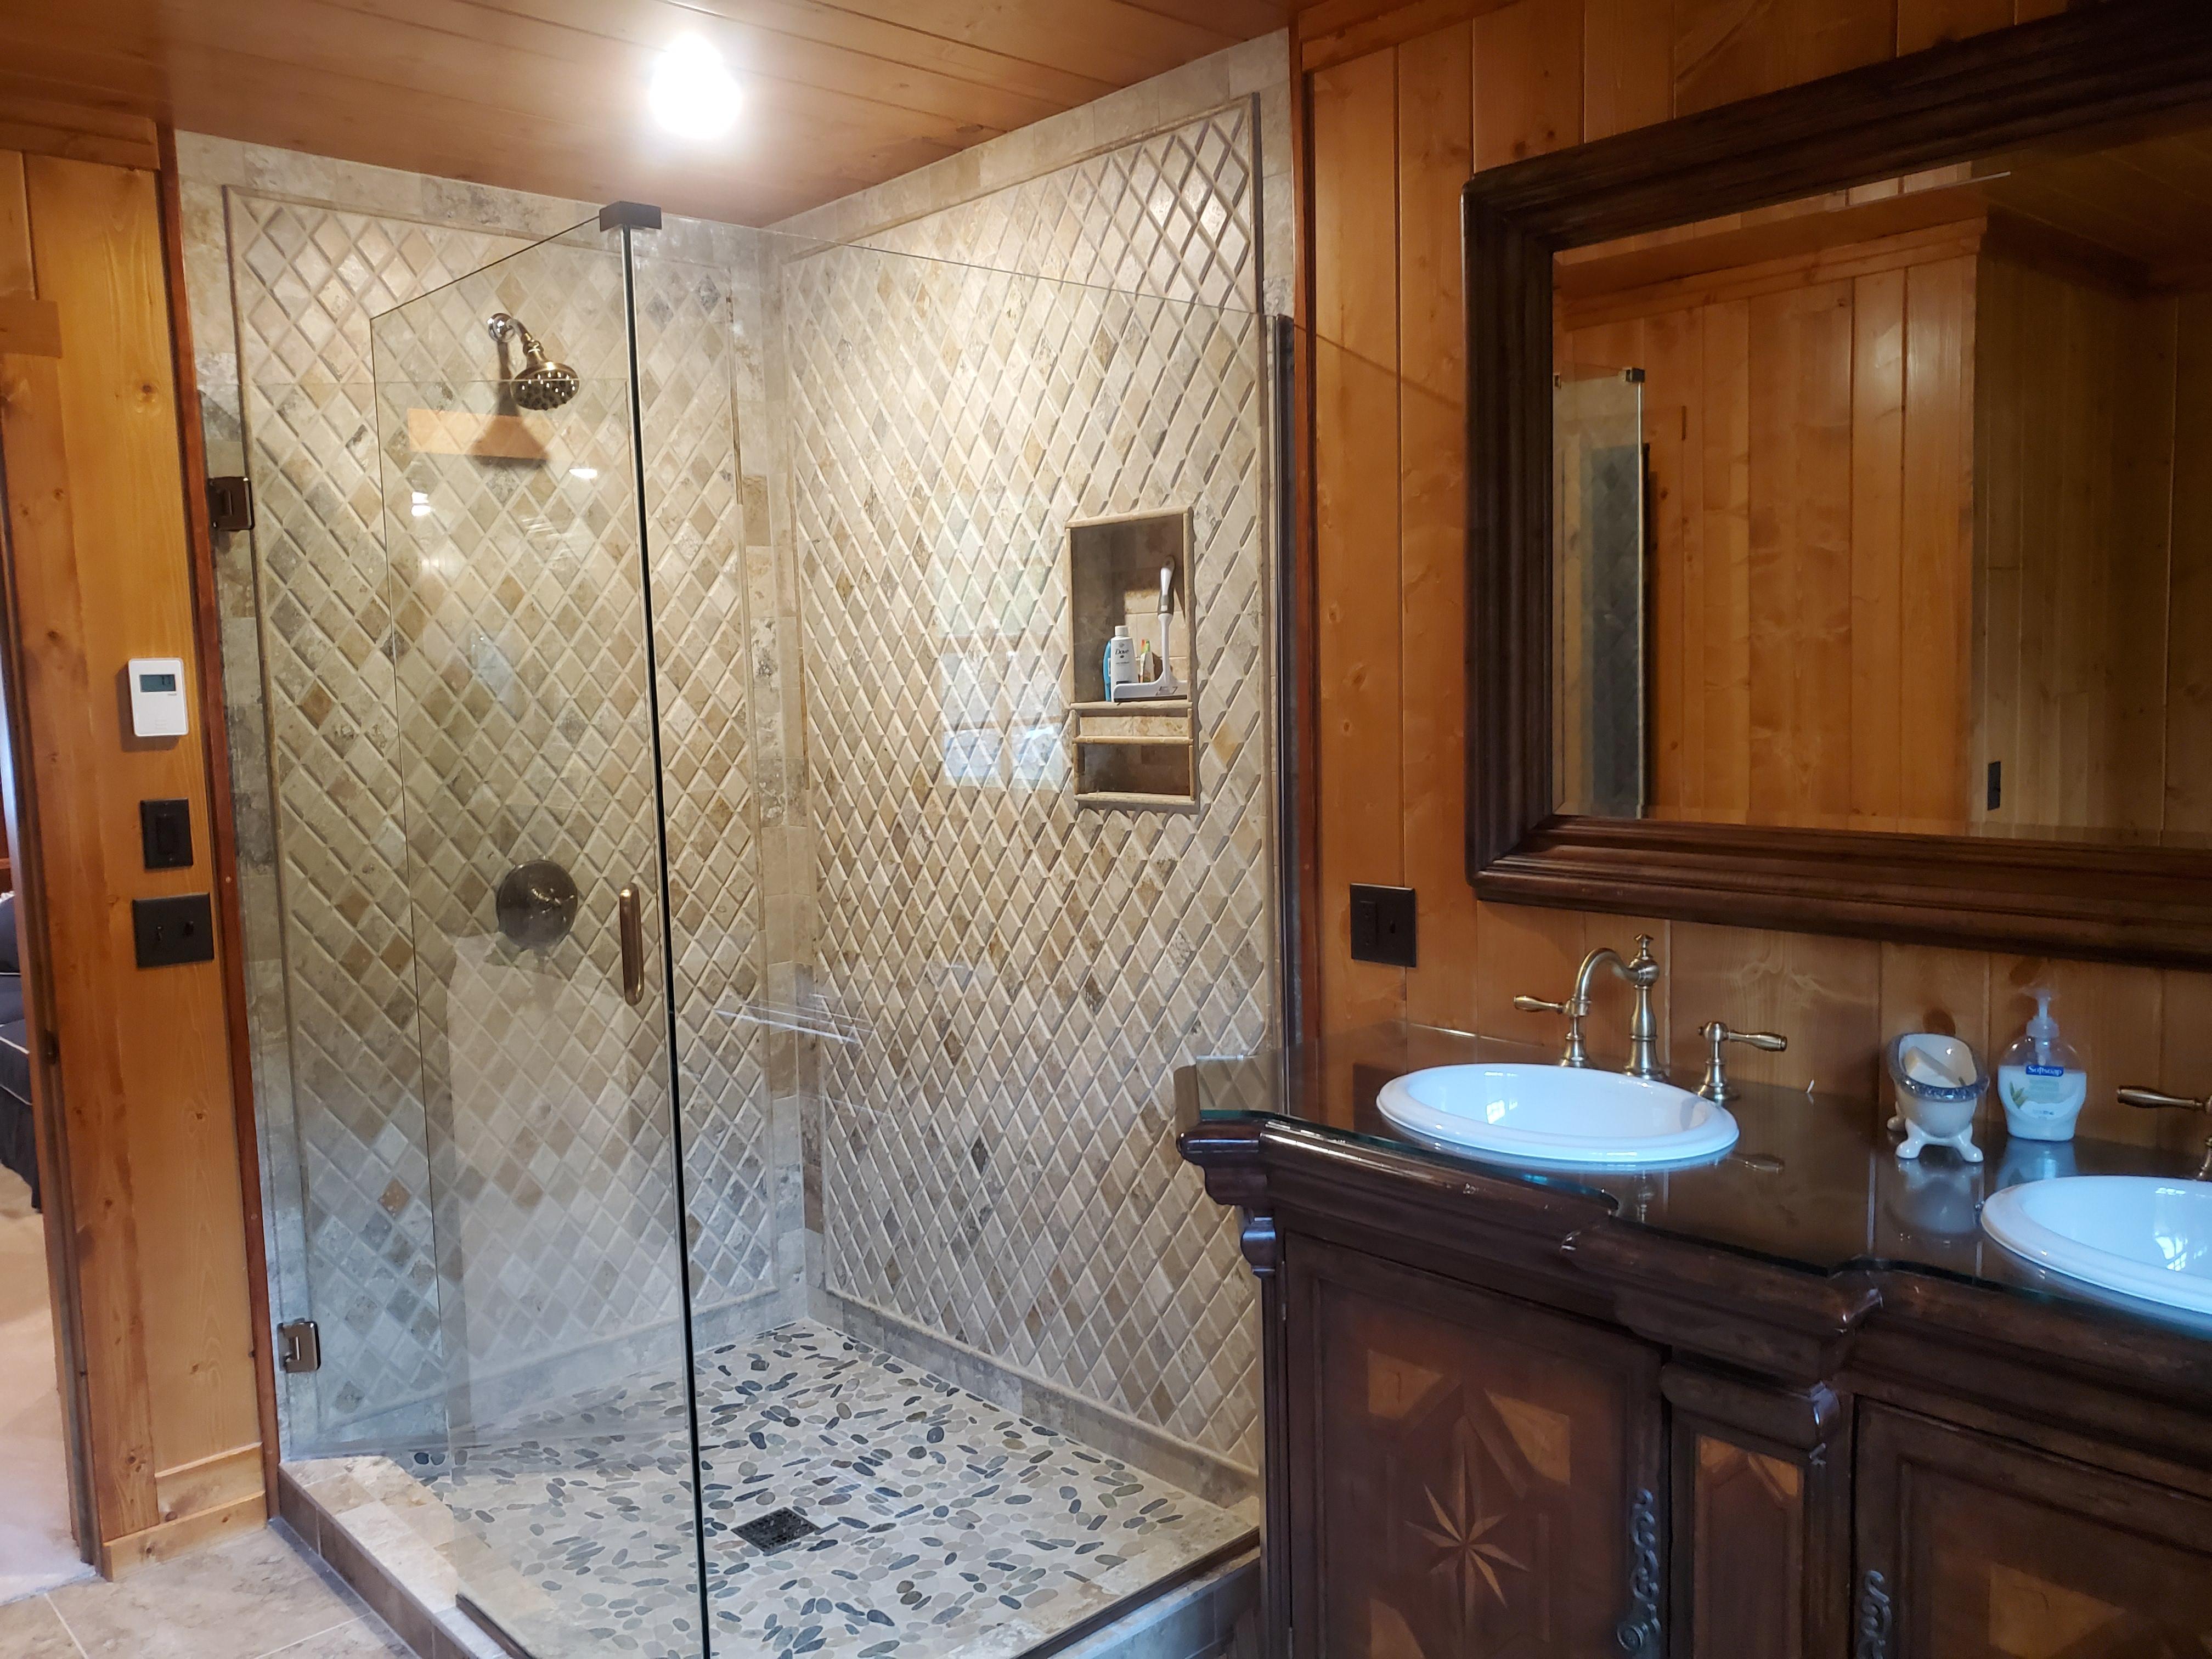 Tiled shower built for real